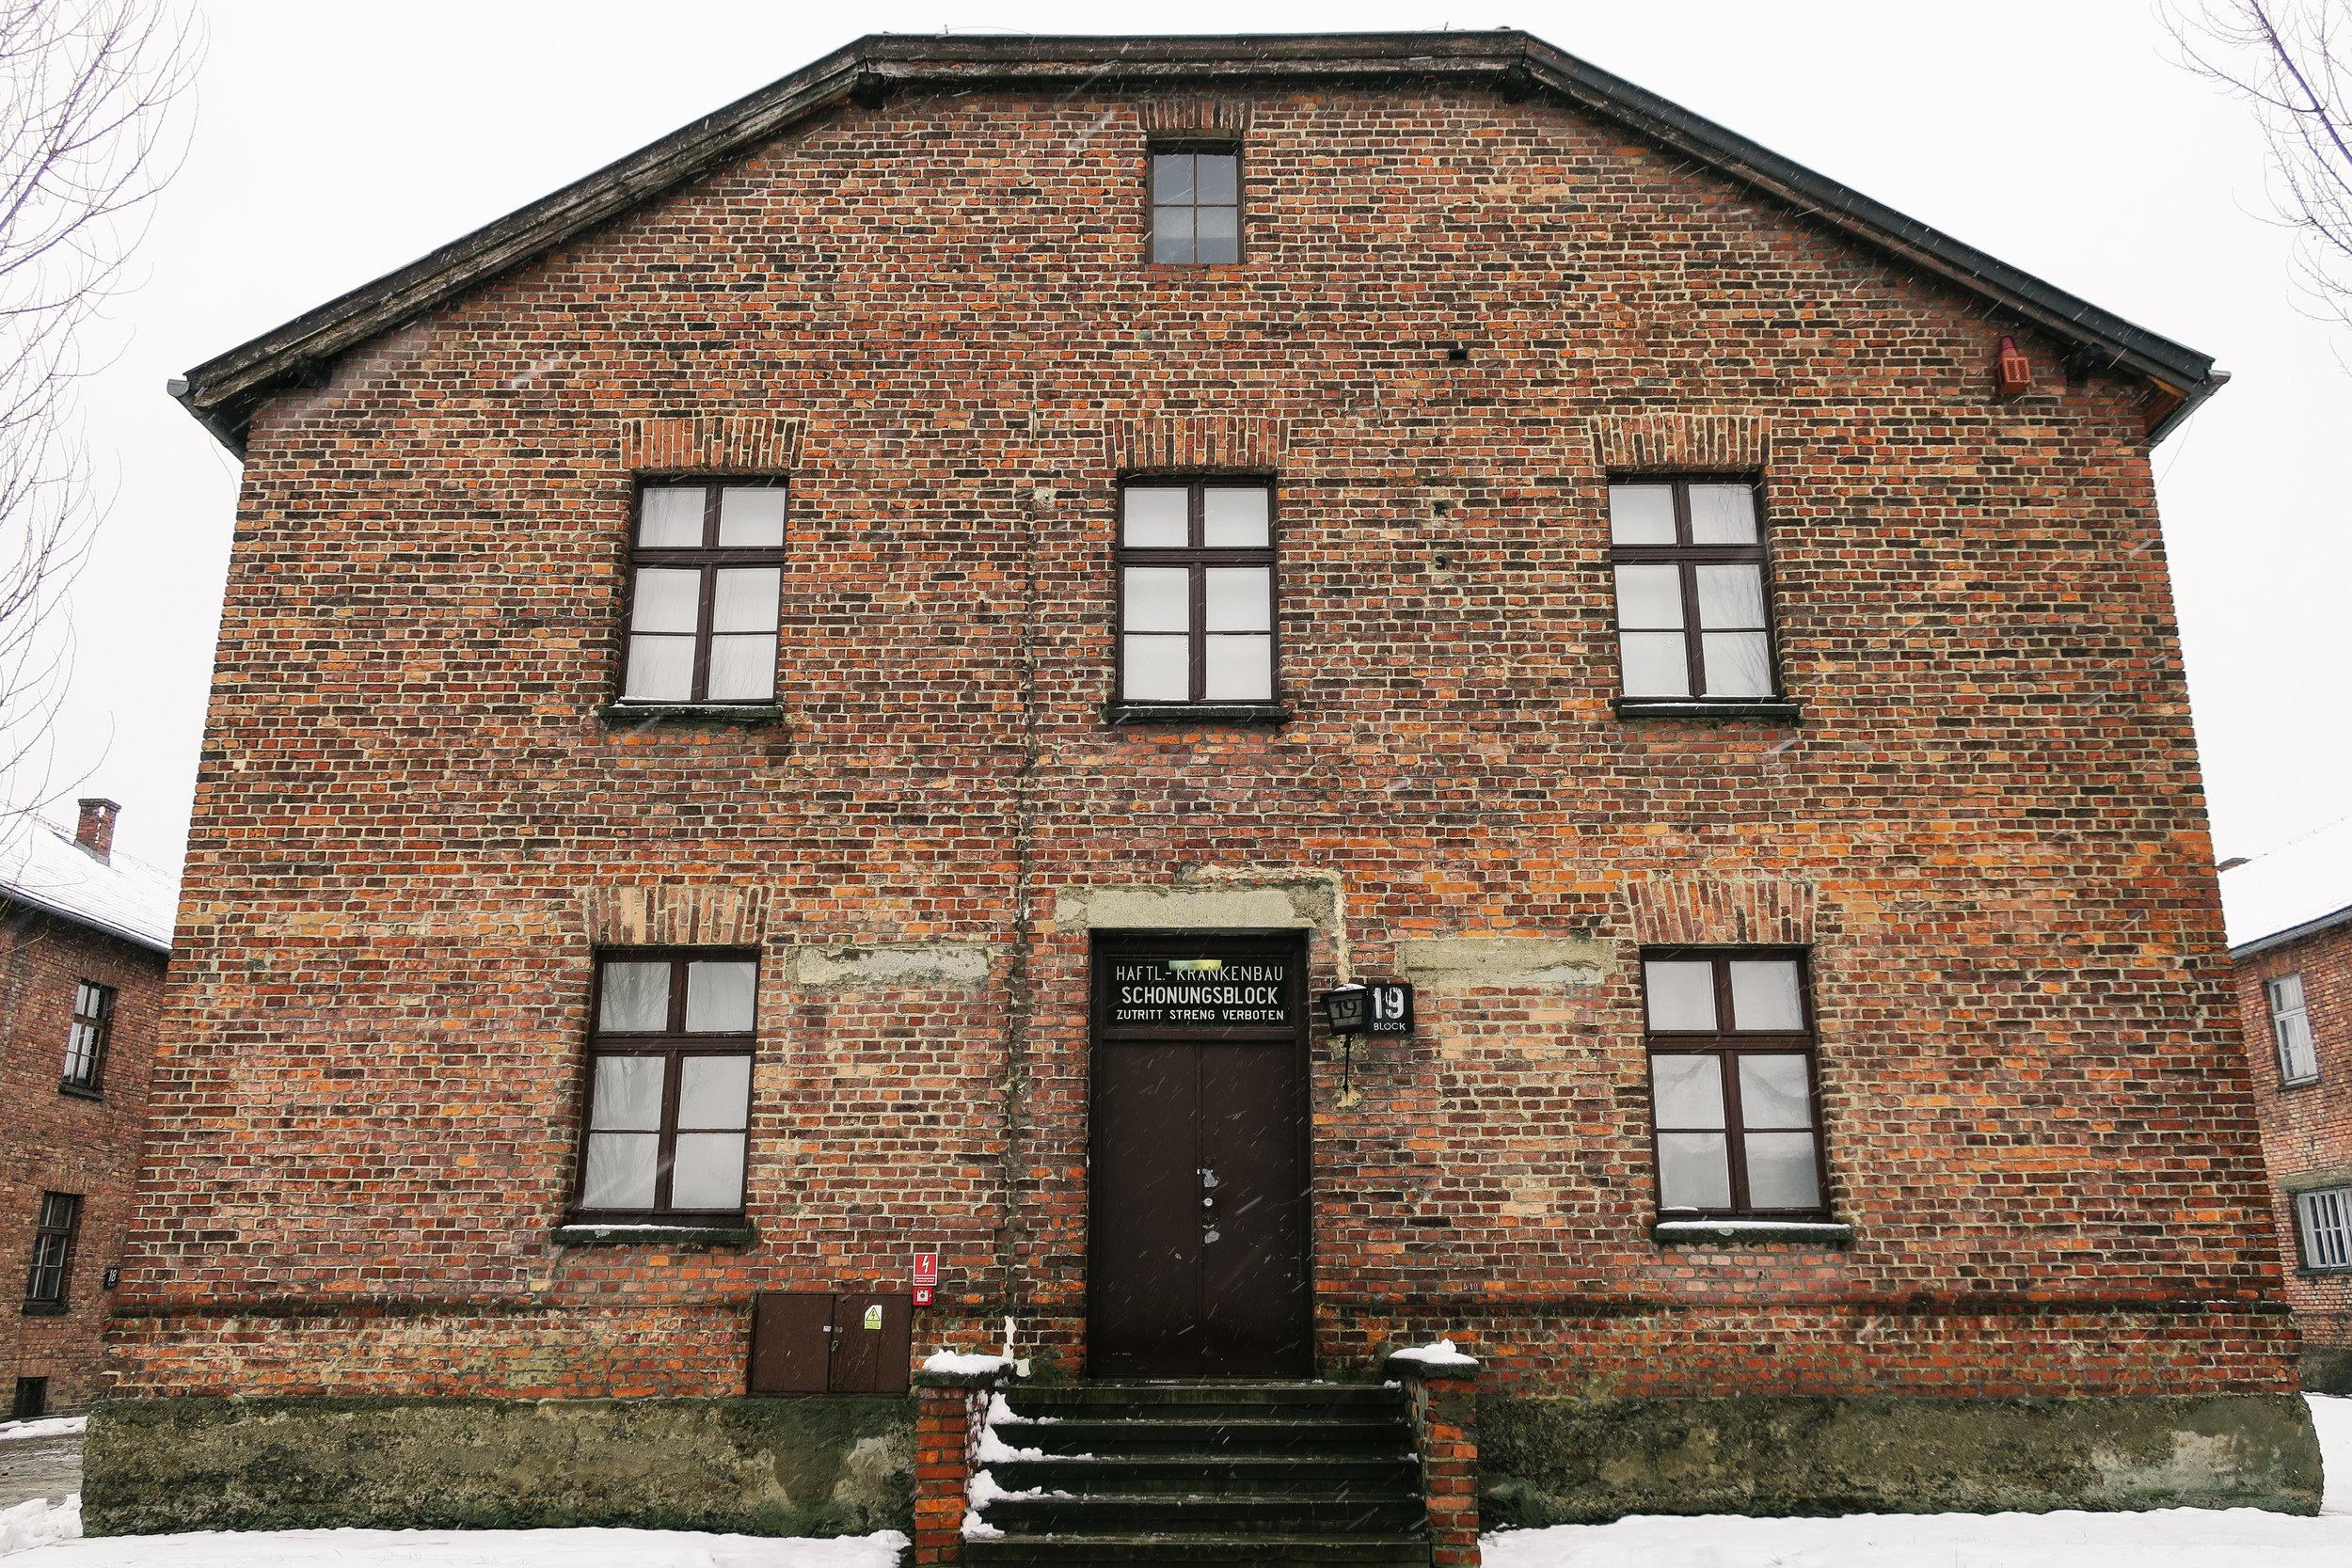 aushwitz-krakow-poland-travel-guide-lifeonpin_IMG_0209.jpg